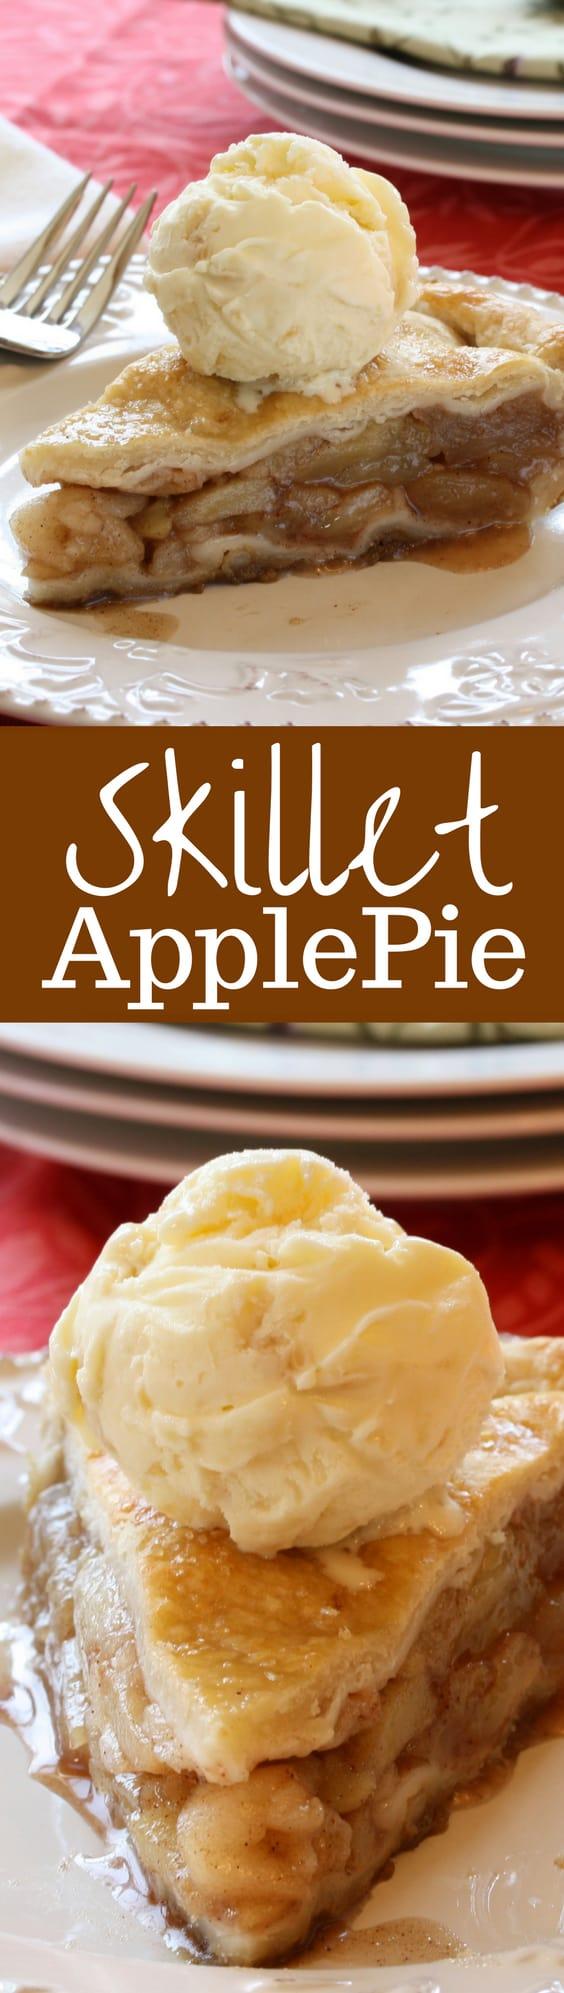 skillet-apple-pie